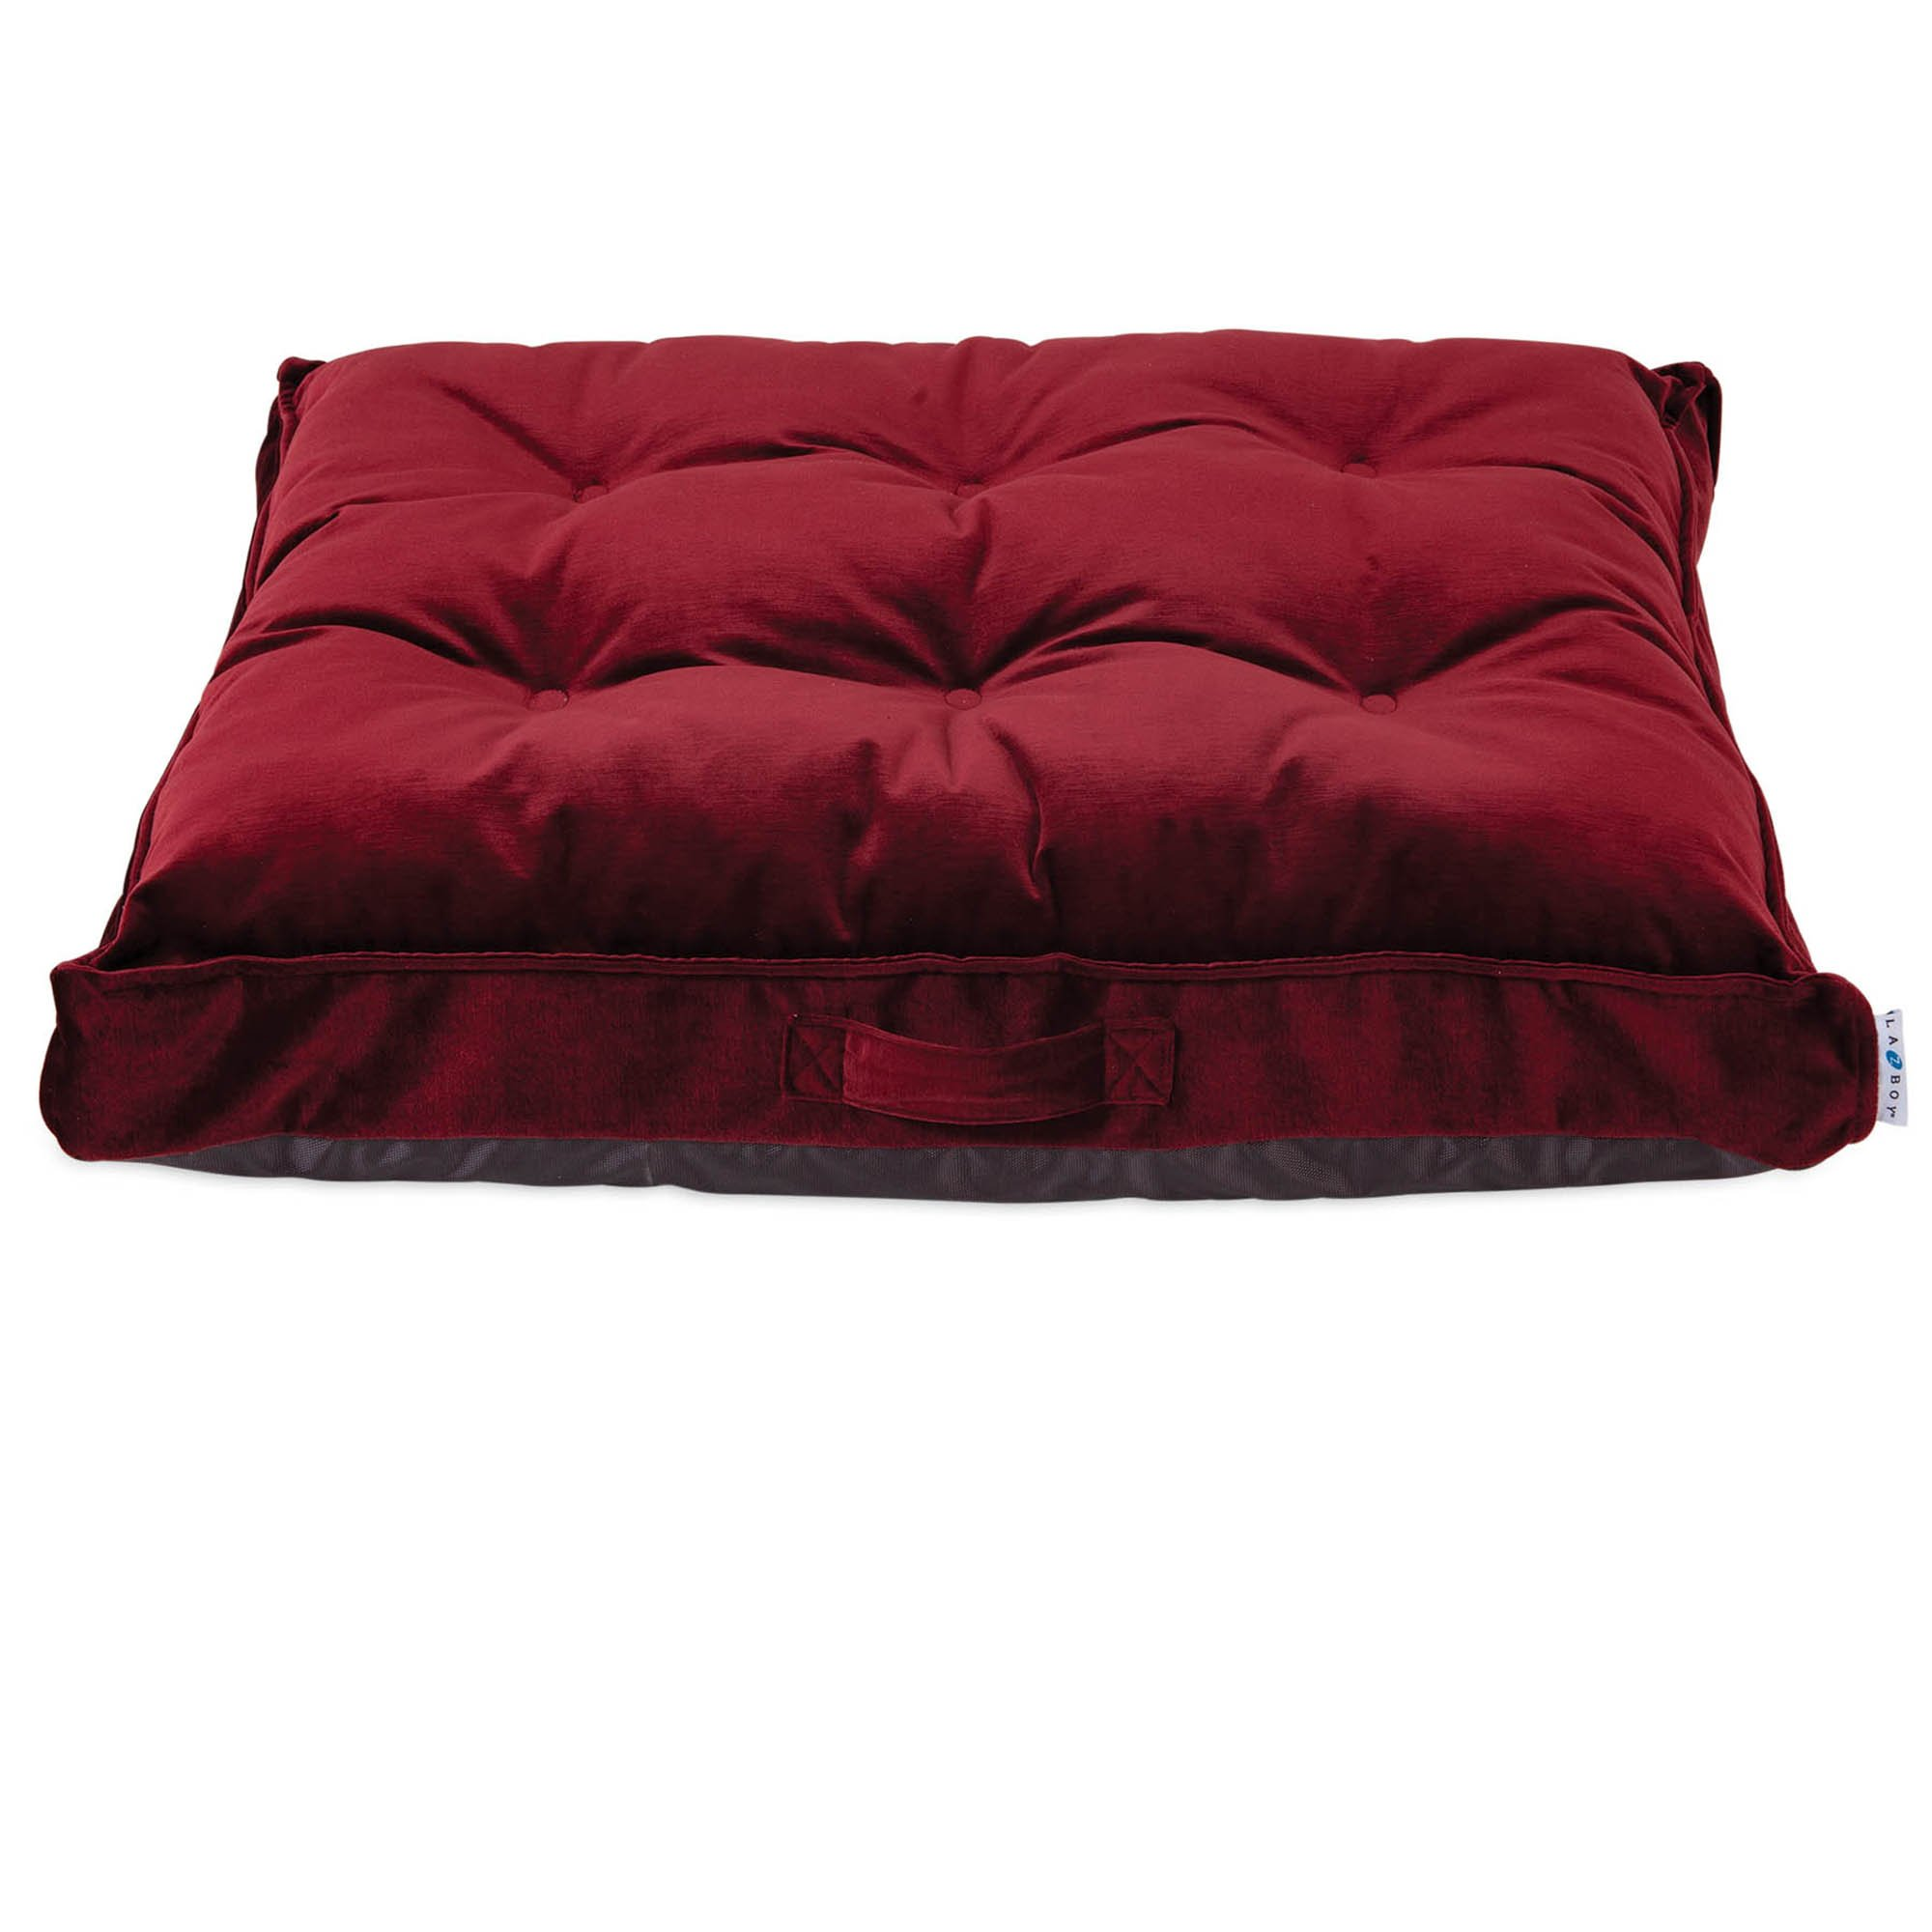 "La Z Boy Cooper Mattress Merlot Dog Bed, 36"" L X 27"" W, Large"